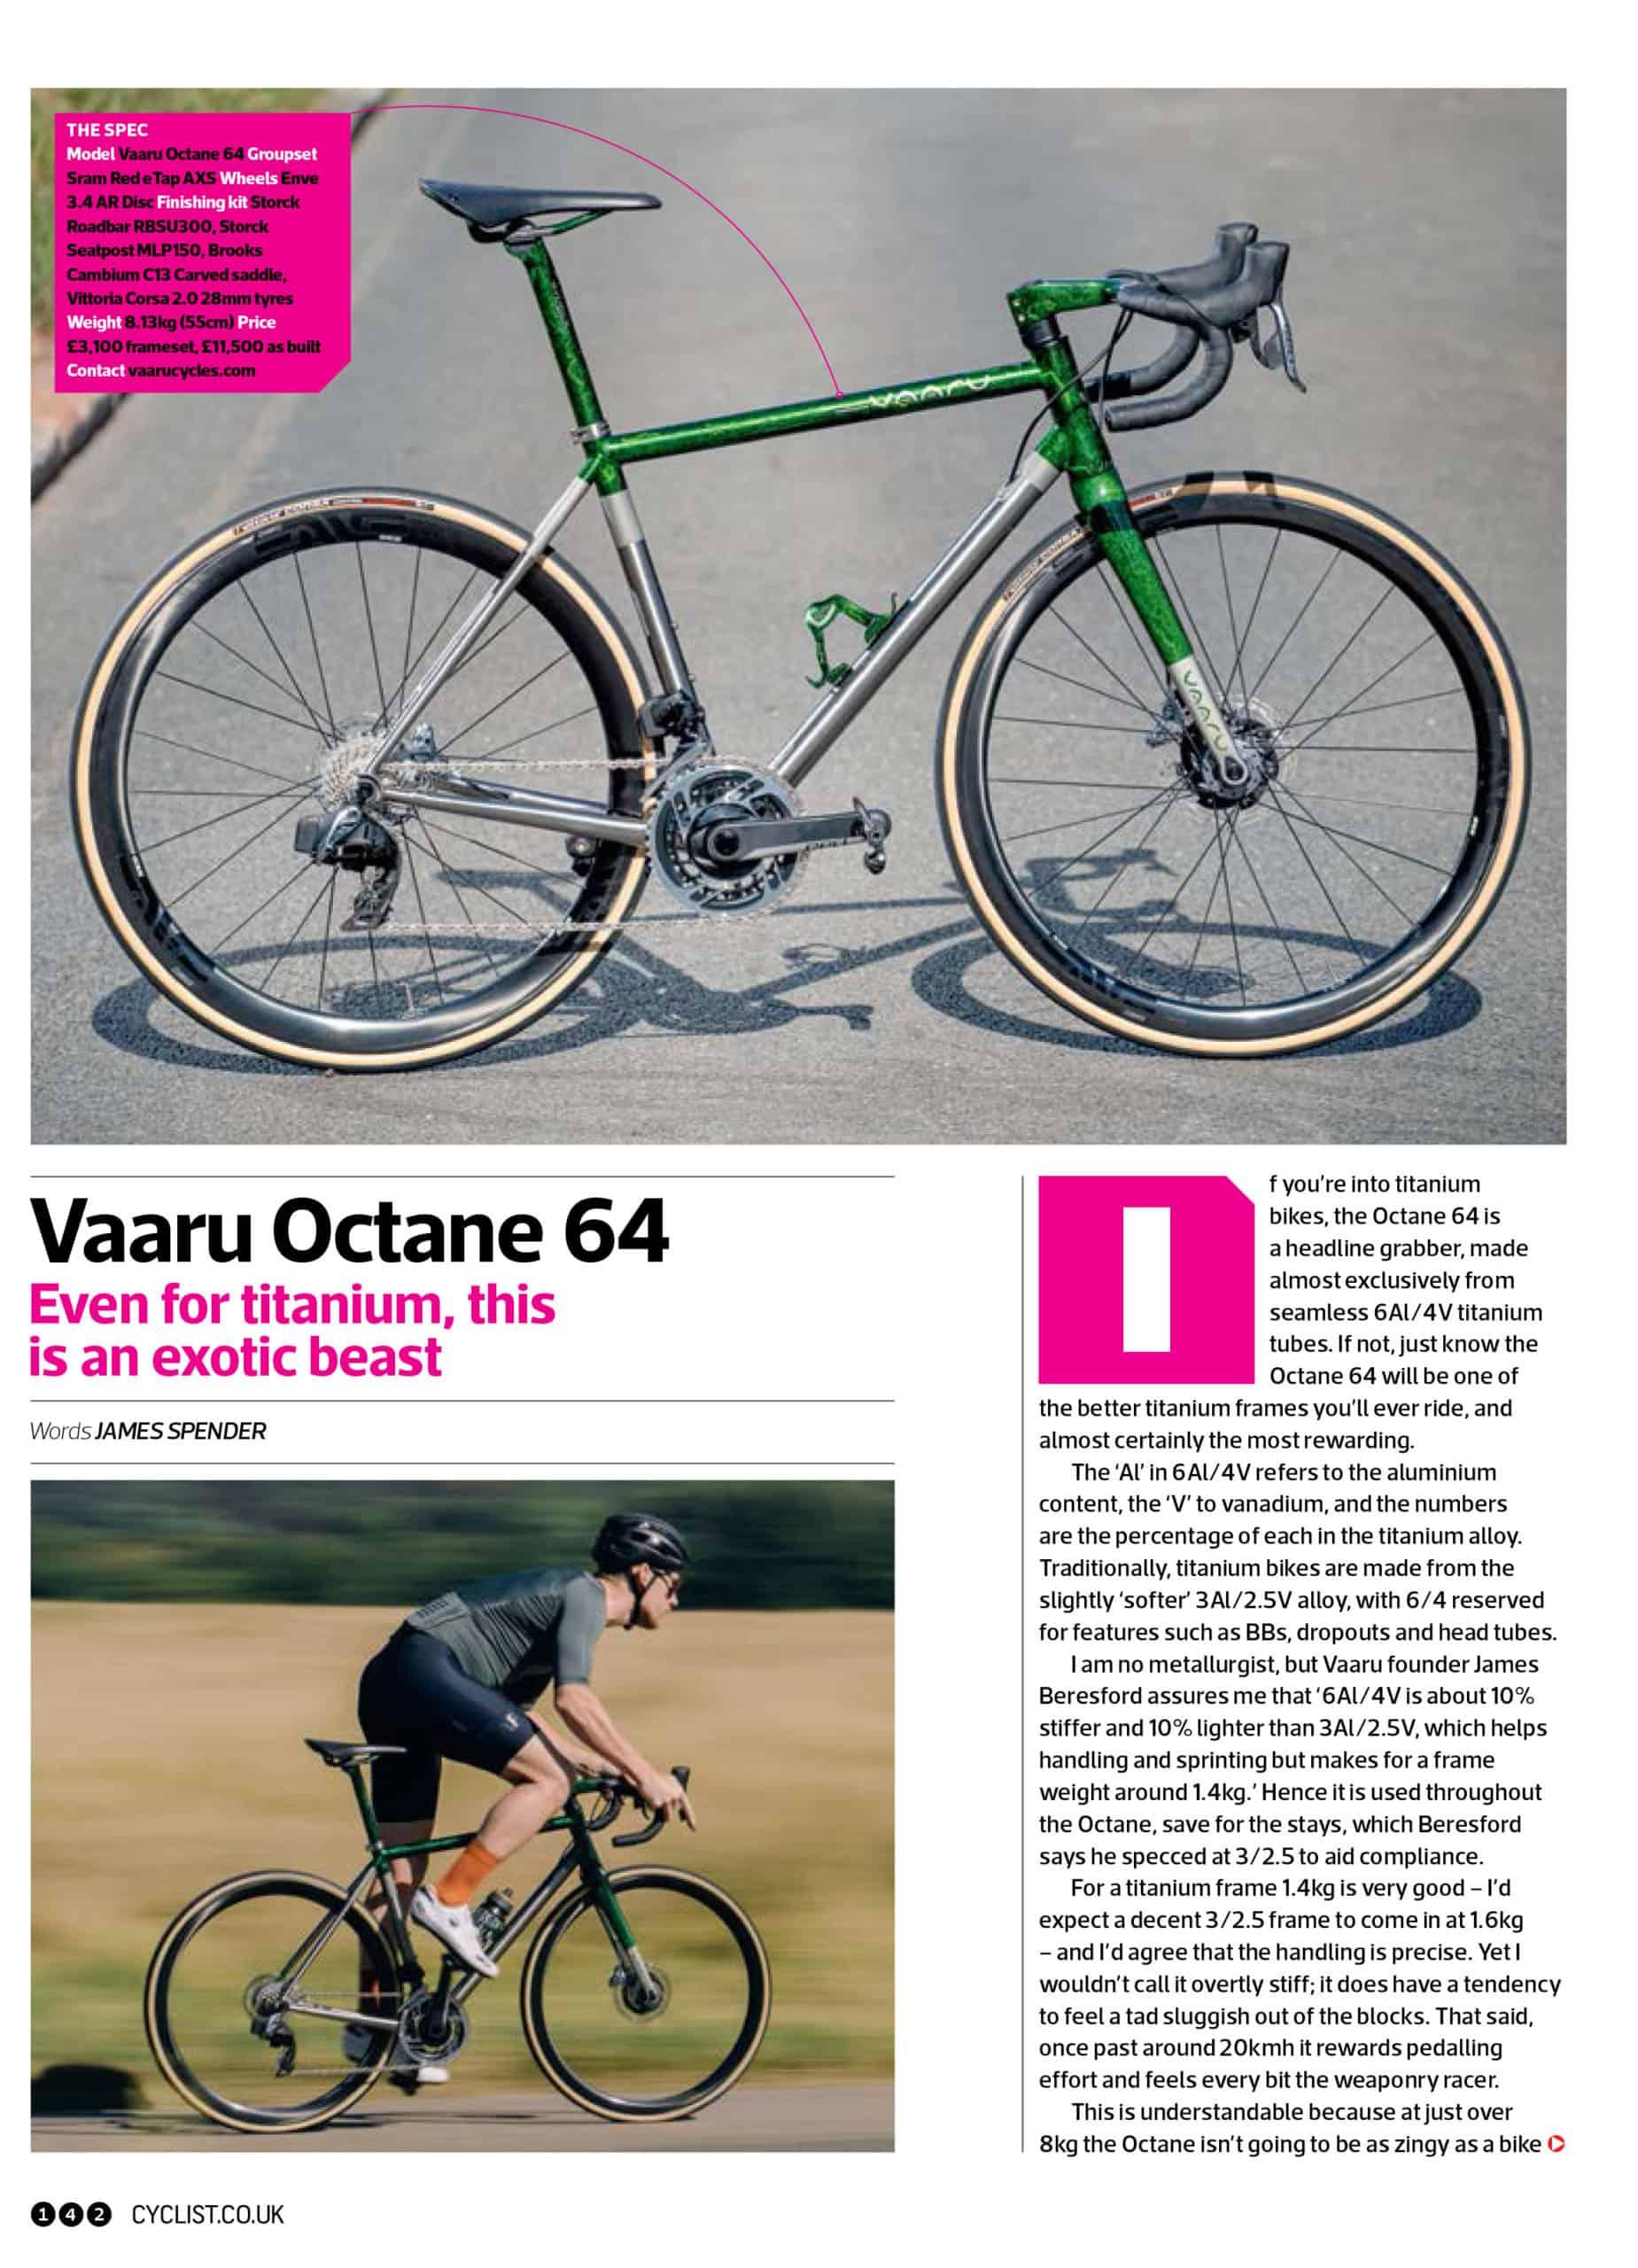 Cycling-Weekly-Dec-2019-Vaaru-Octane-64-Disc-Review-p1a